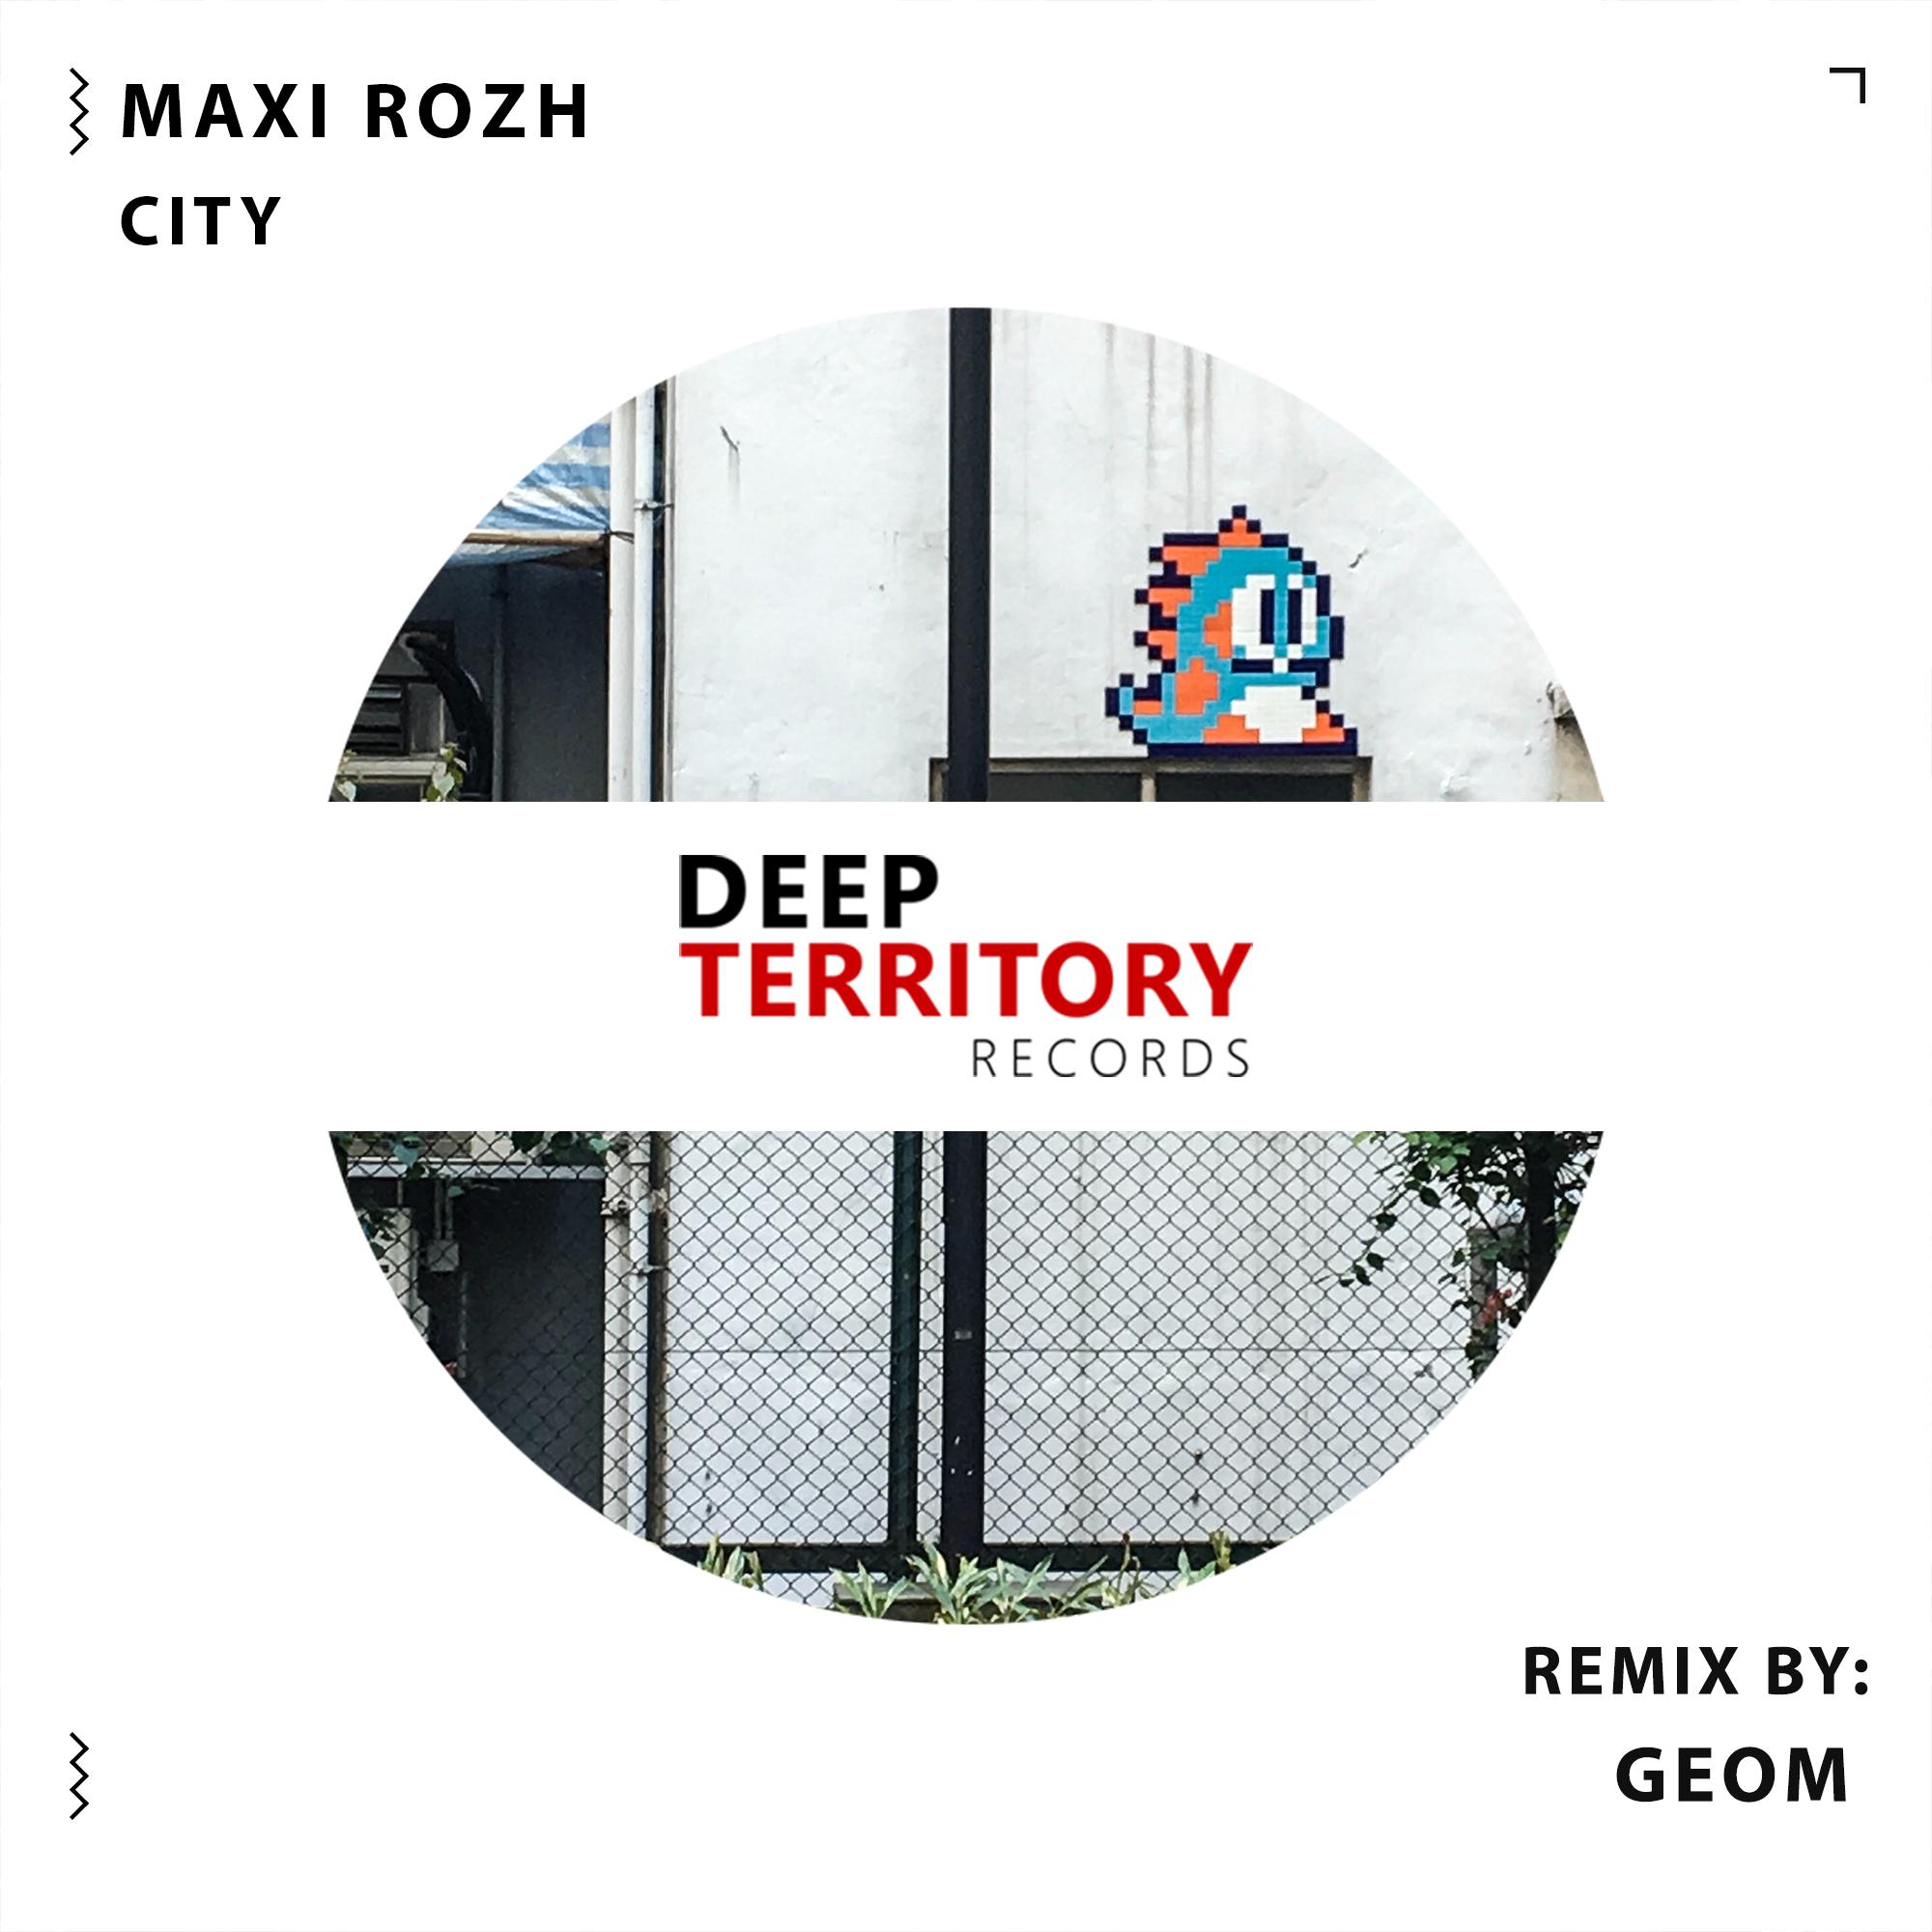 maxi rozh city